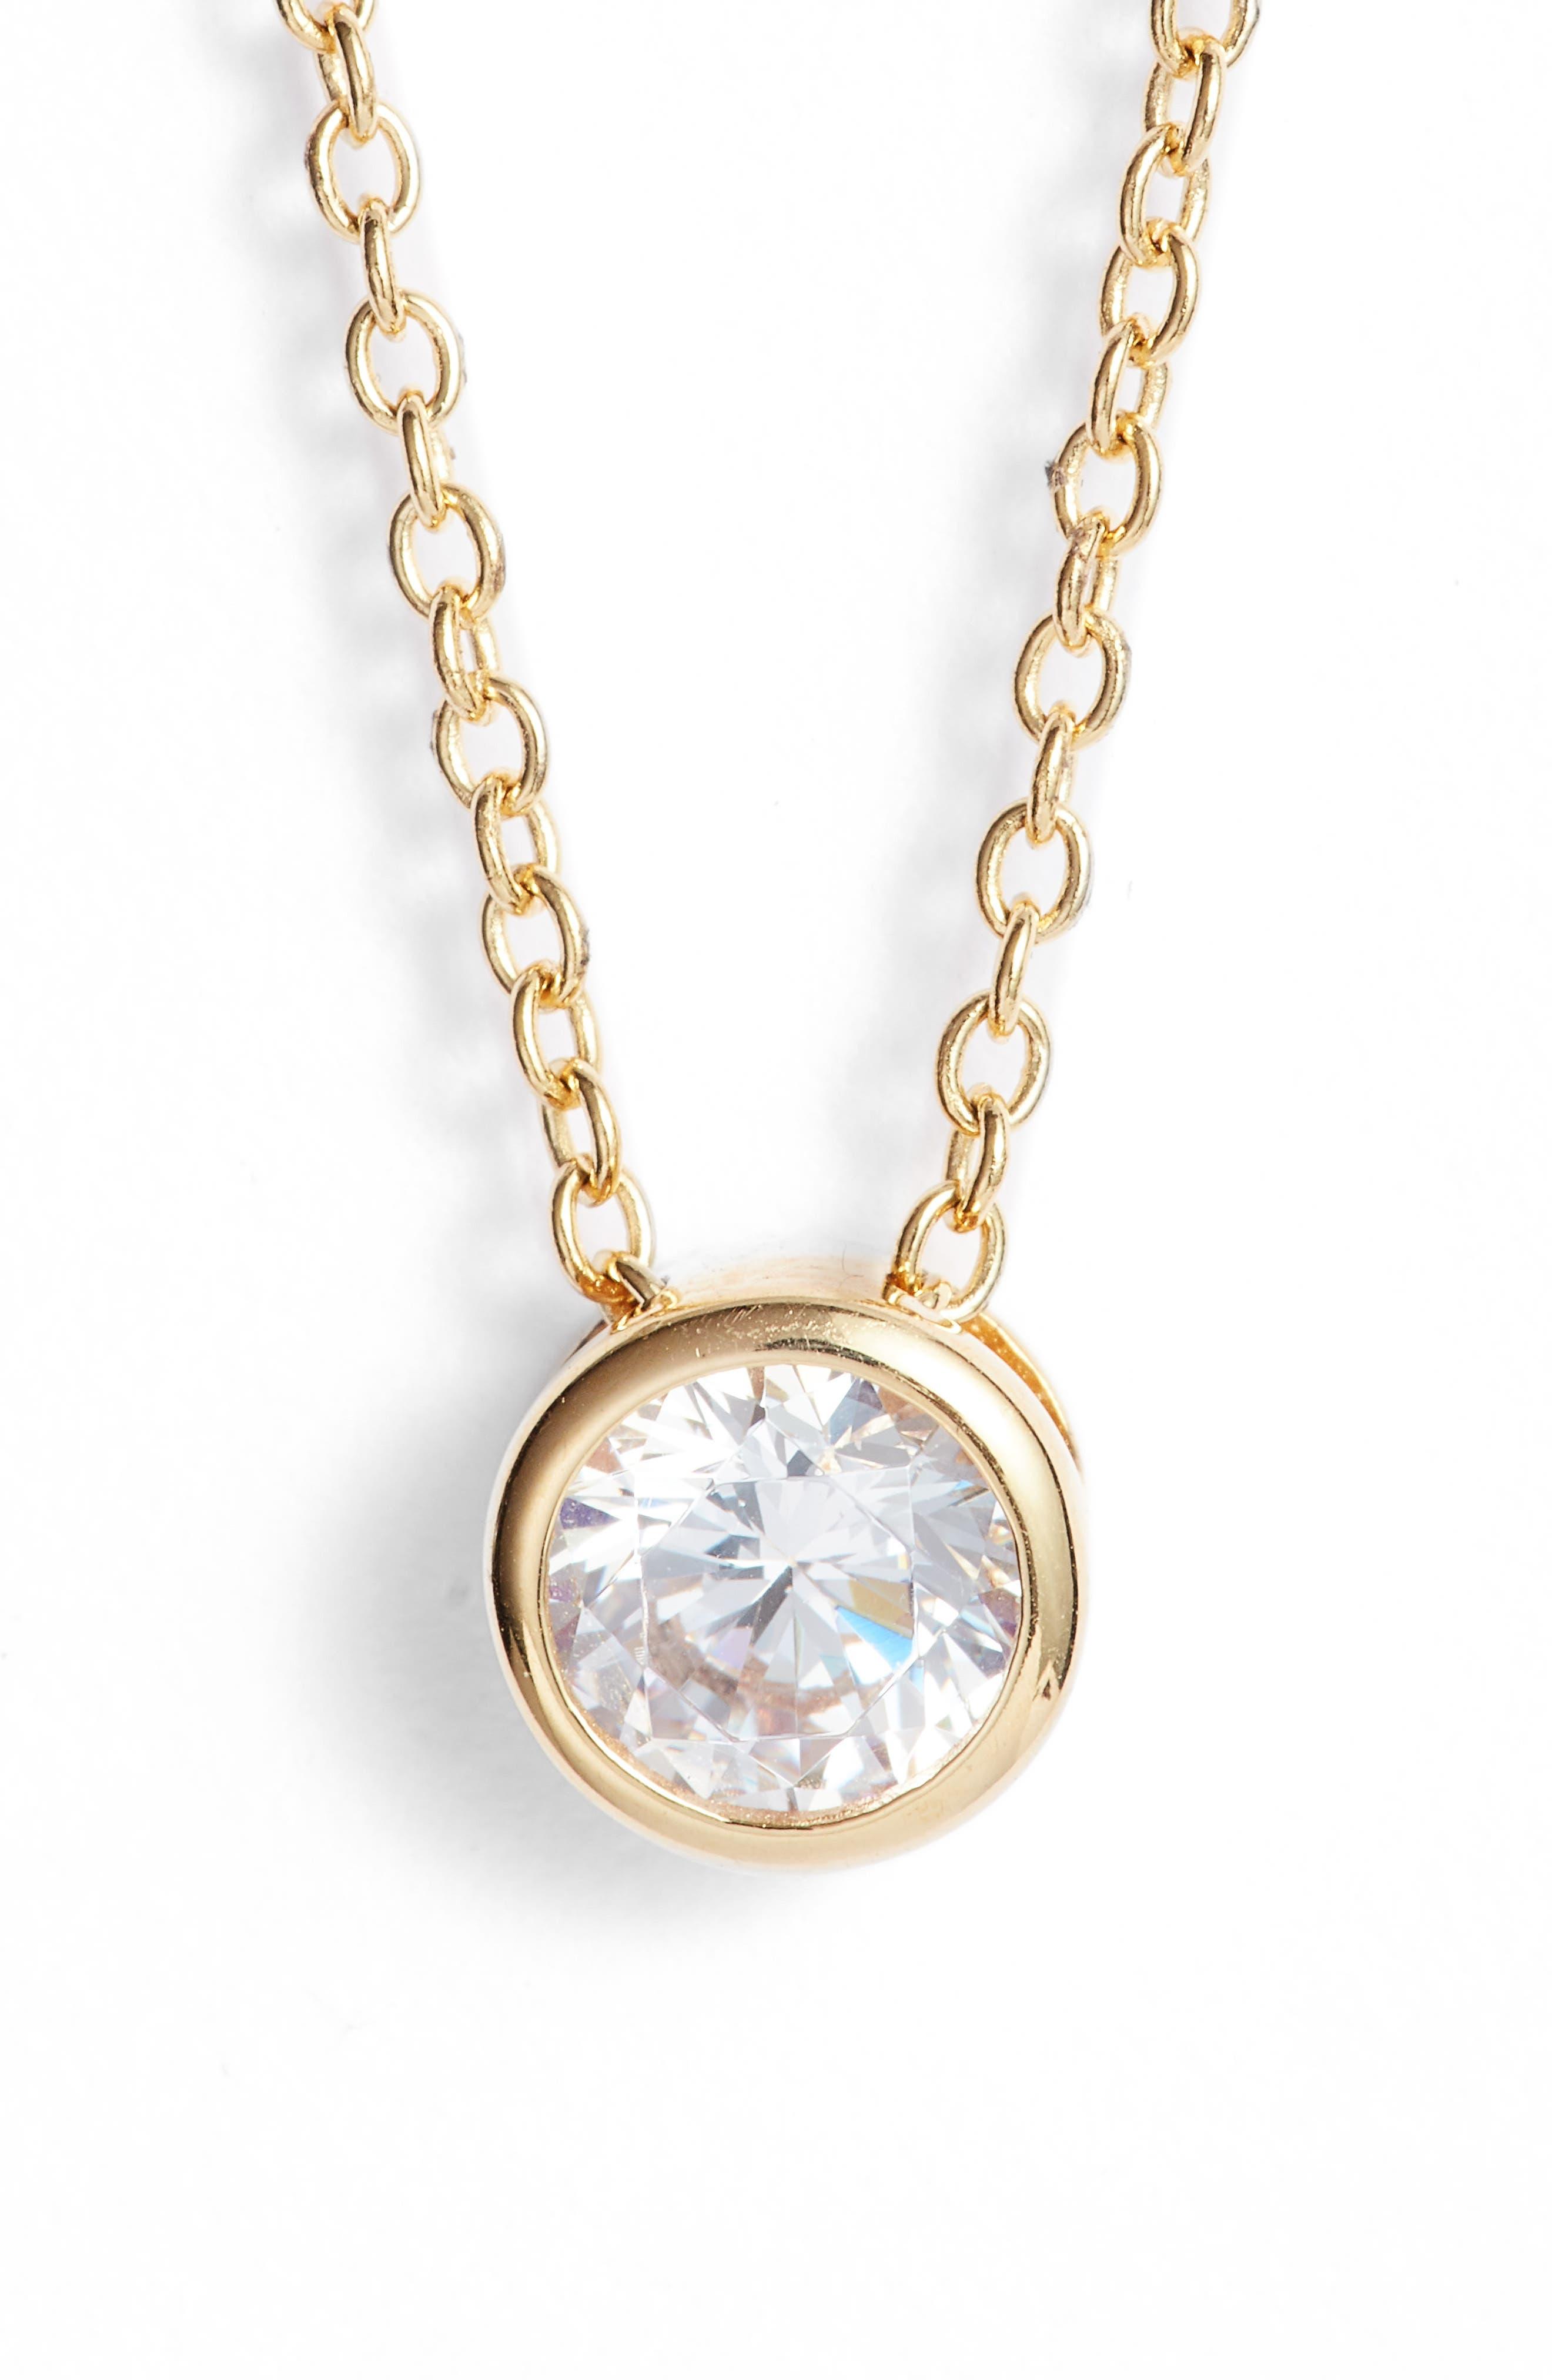 NORDSTROM, 0.5 ct tw Cubic Zirconia Pendant Necklace, Main thumbnail 1, color, GOLD